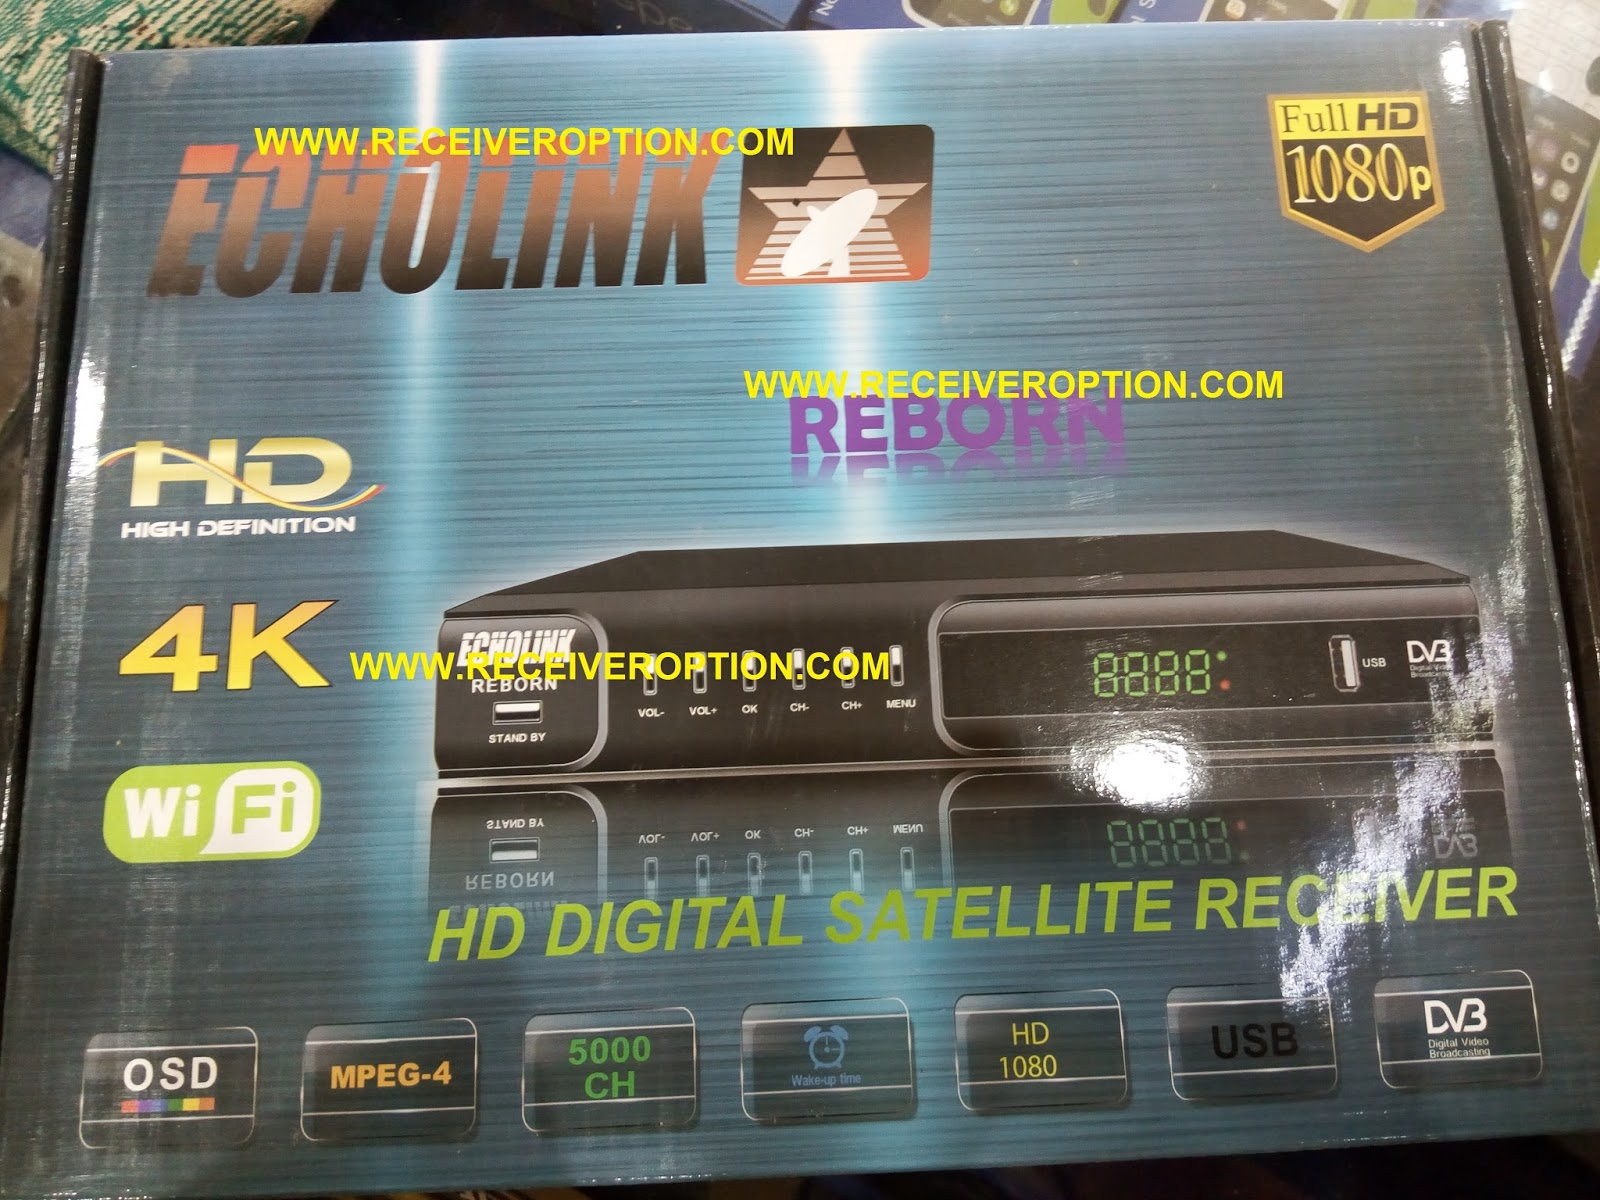 Echolink Satellite Receiver Software Download